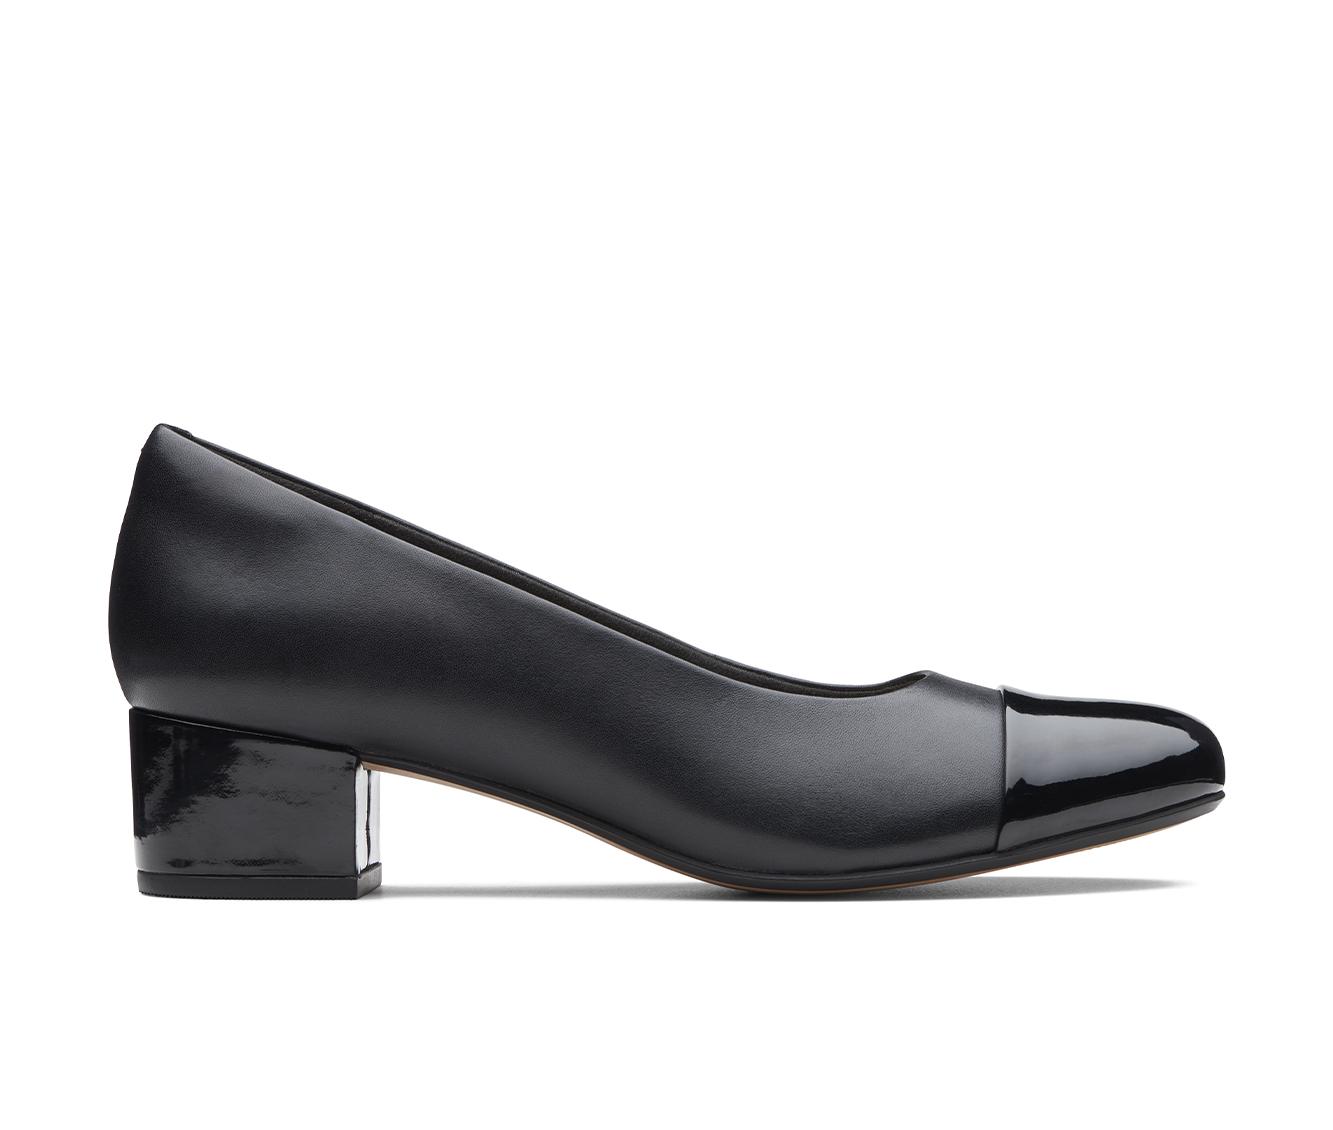 Clarks Chartli Diva Women's Dress Shoe (Black Leather)